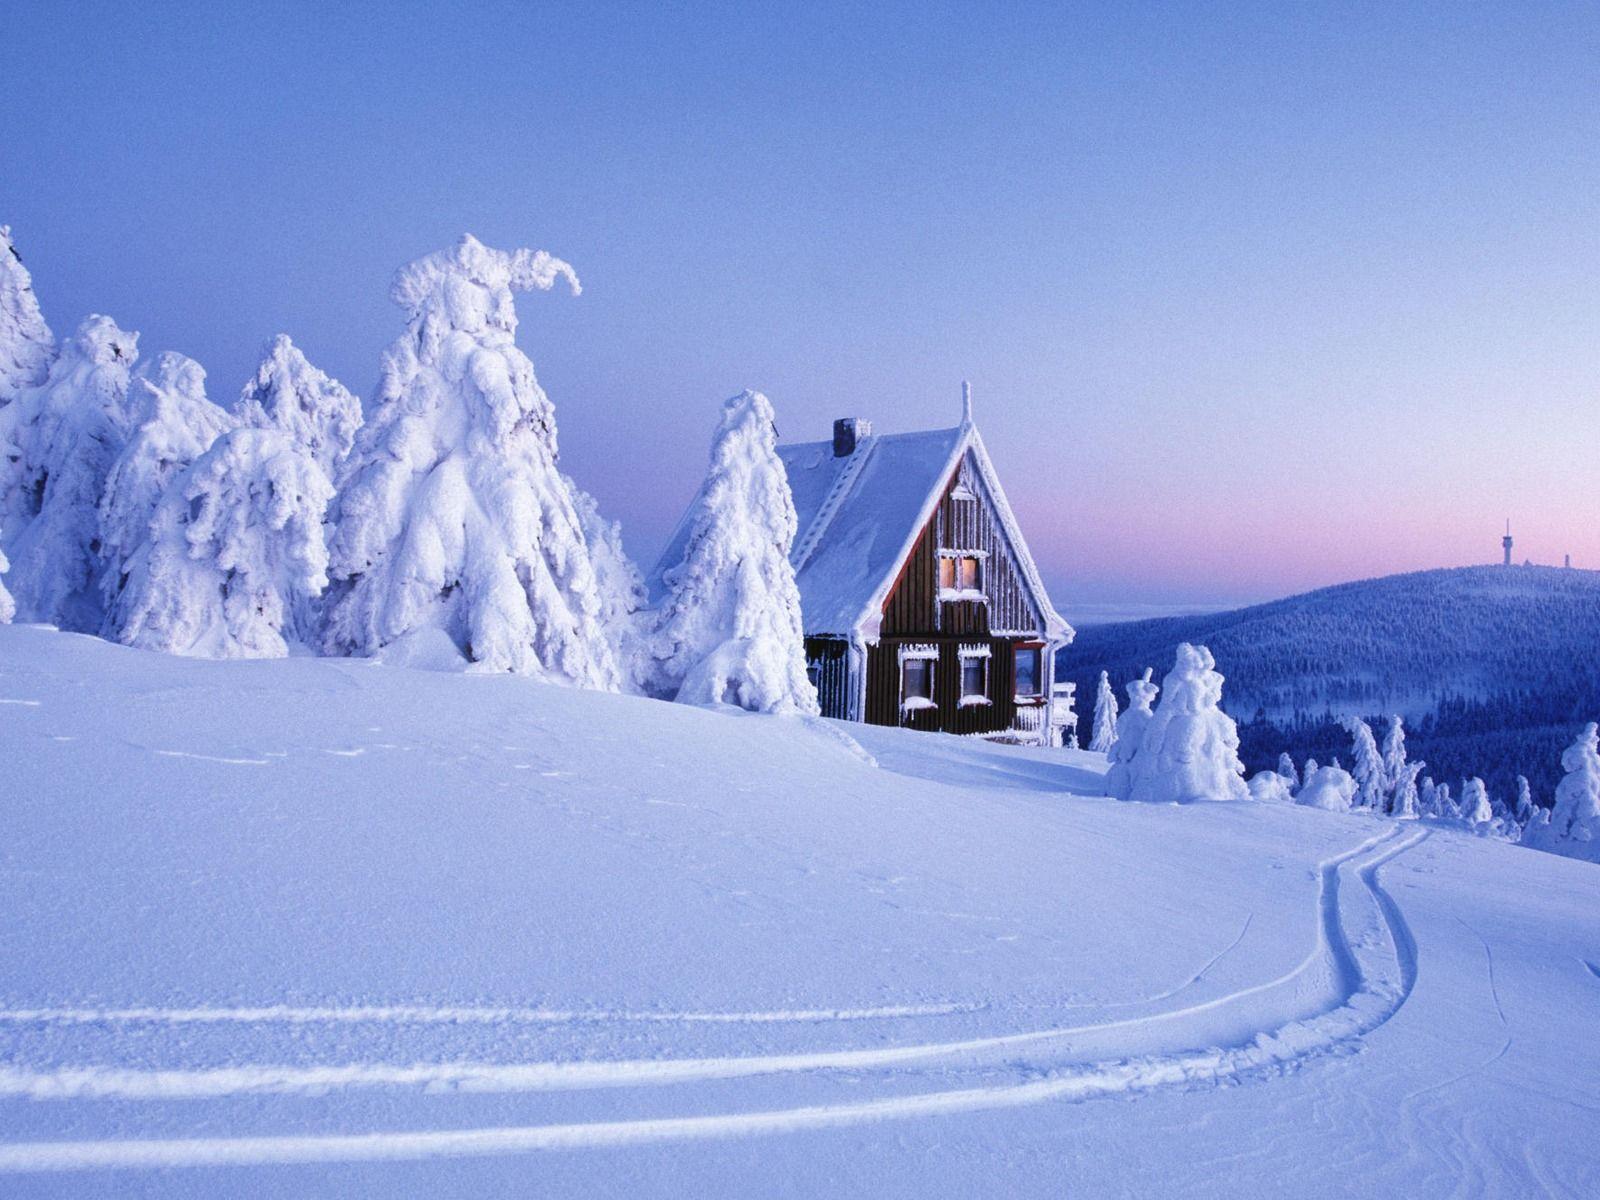 old cabin winter scene wallpaper - photo #7